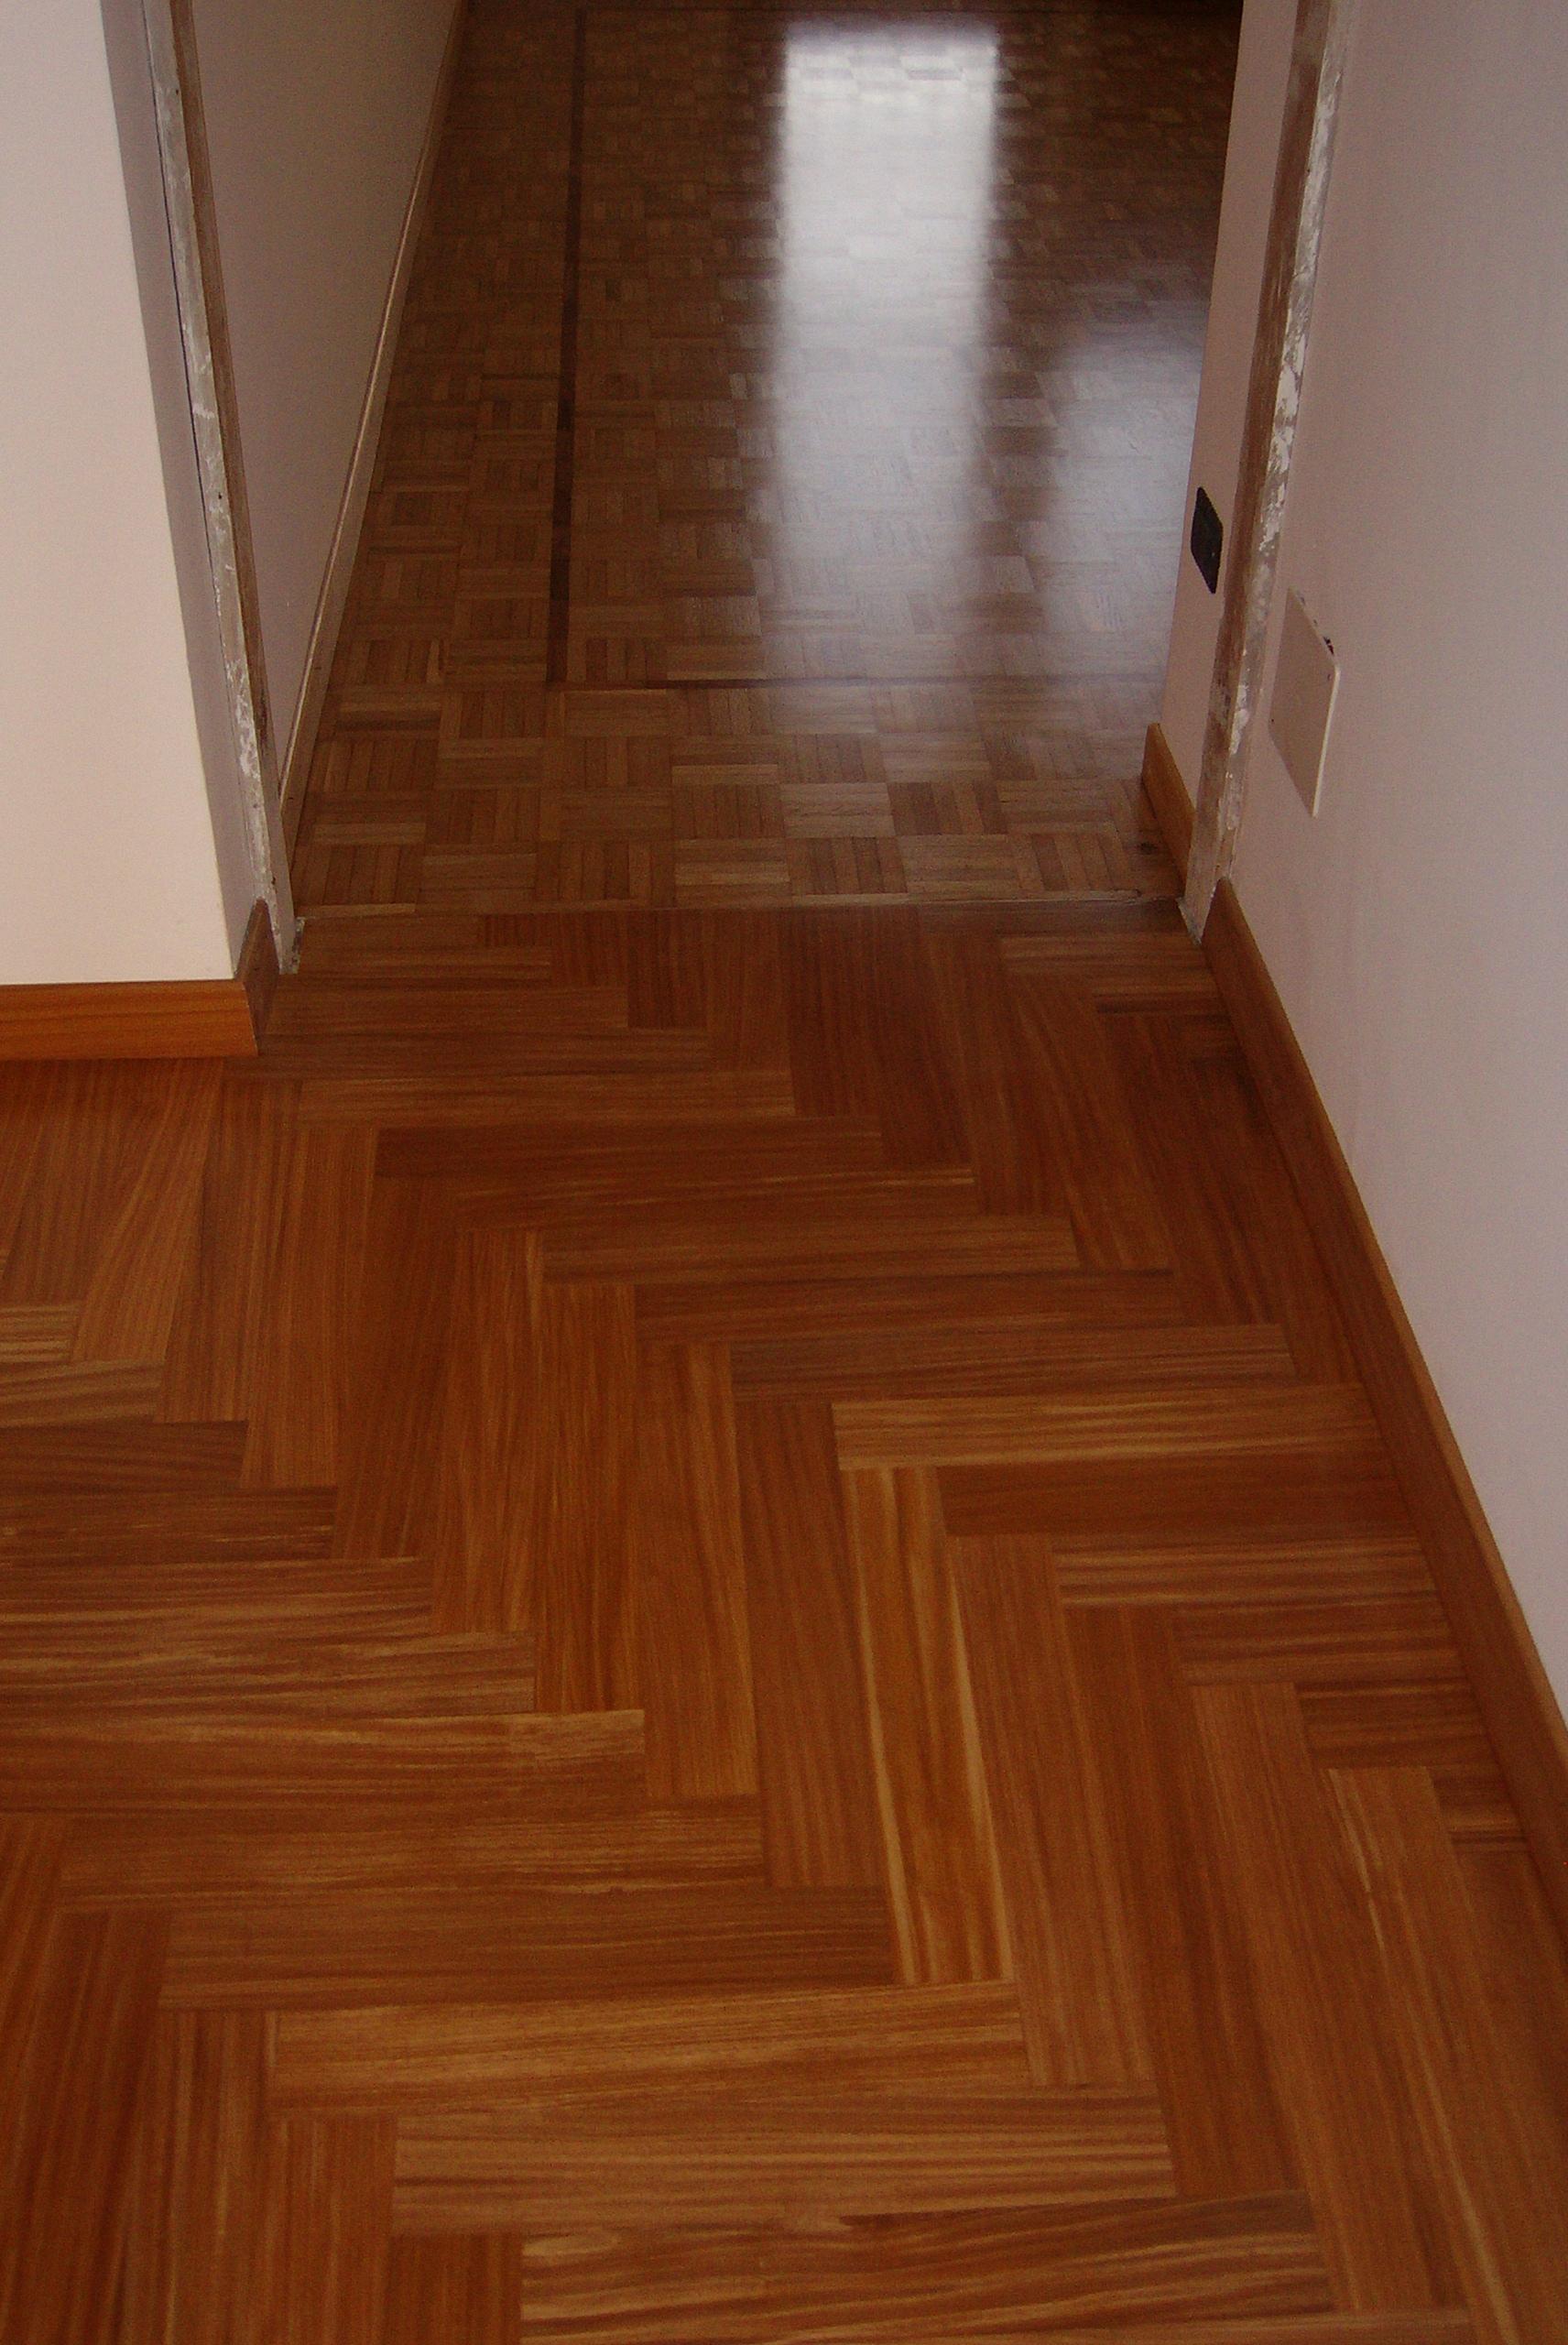 118 Pavimento verniciato satinato - priv